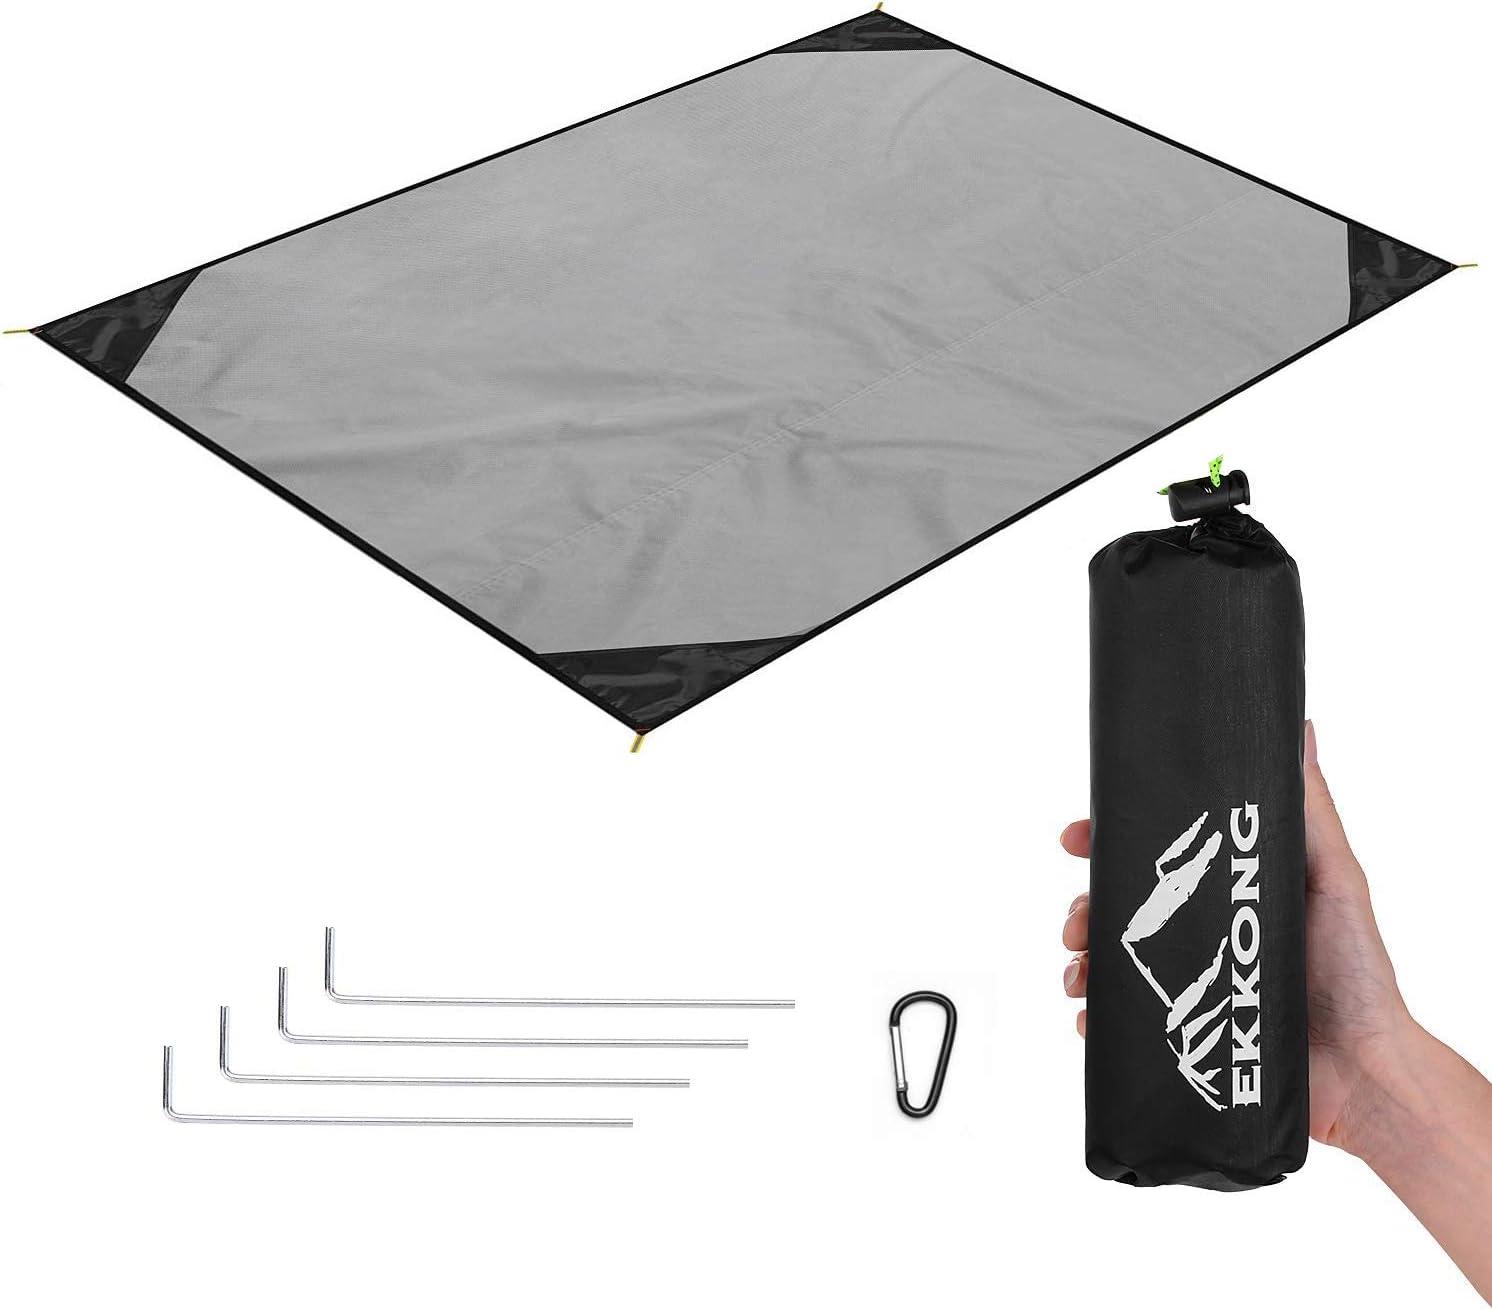 EKKONG Manta de Picnic Manta de Bolsillo Ultraligera Impermeable pequeña, Manta de Playa portátil, Manta de Camping, Almohadilla para Actividades al Aire Libre (200 * 200cm)